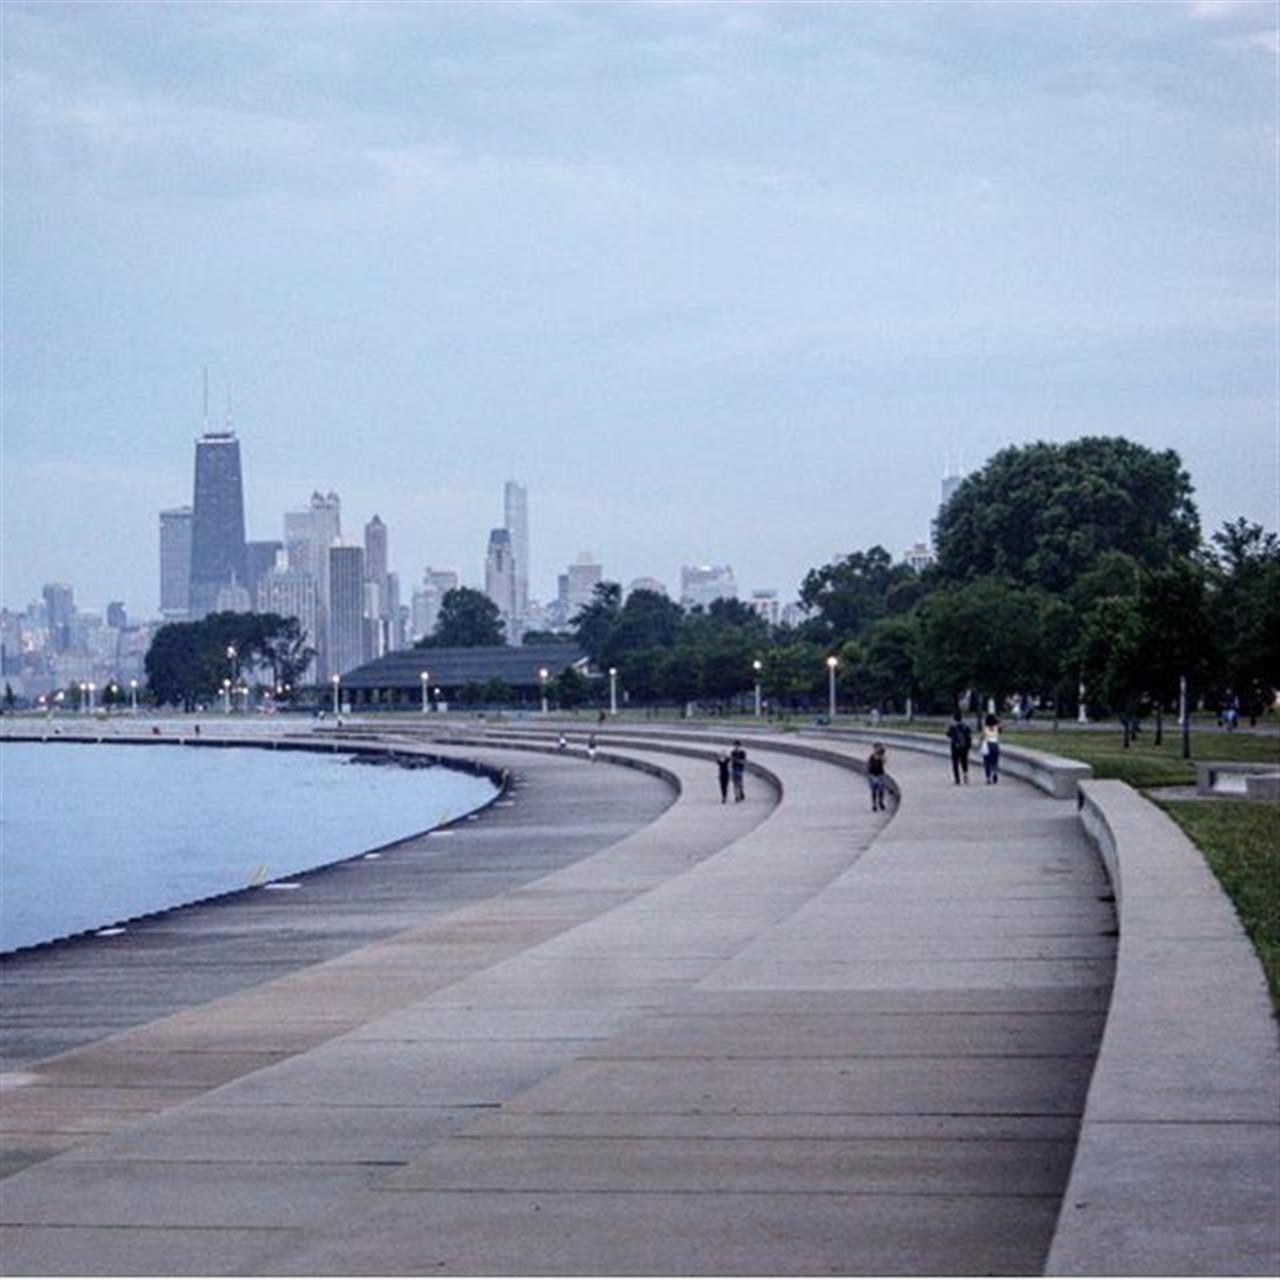 Thinking back to overcast walks along Chicago's #Lakefront . . #chicago #lakemichigan #walk #bike #run #lakefrontpath #lakefront #summer #summernights #overcast #cloudywithachanceofmeatballs #leadingrelocal #livelocal #bairdwarner